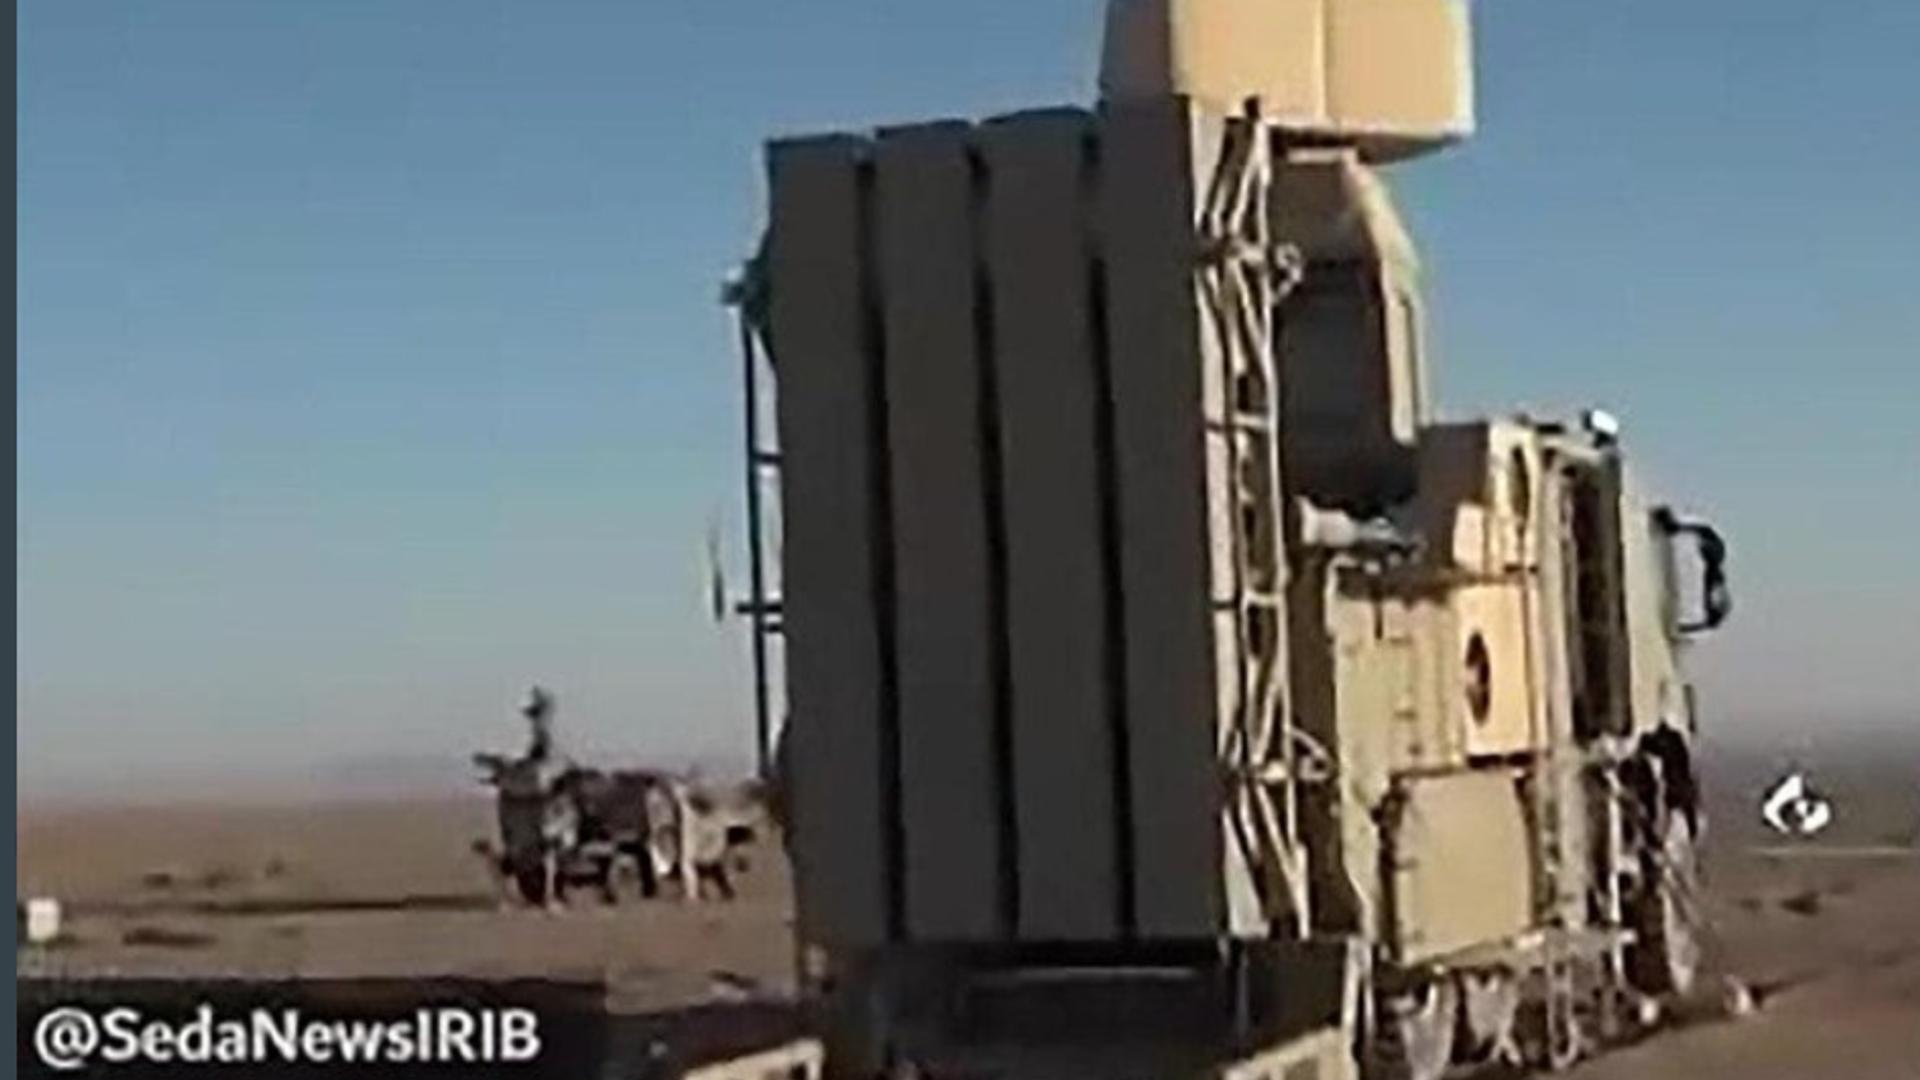 Mystery Iranian vertical launch air defence system. - Sputnik International, 1920, 13.10.2021